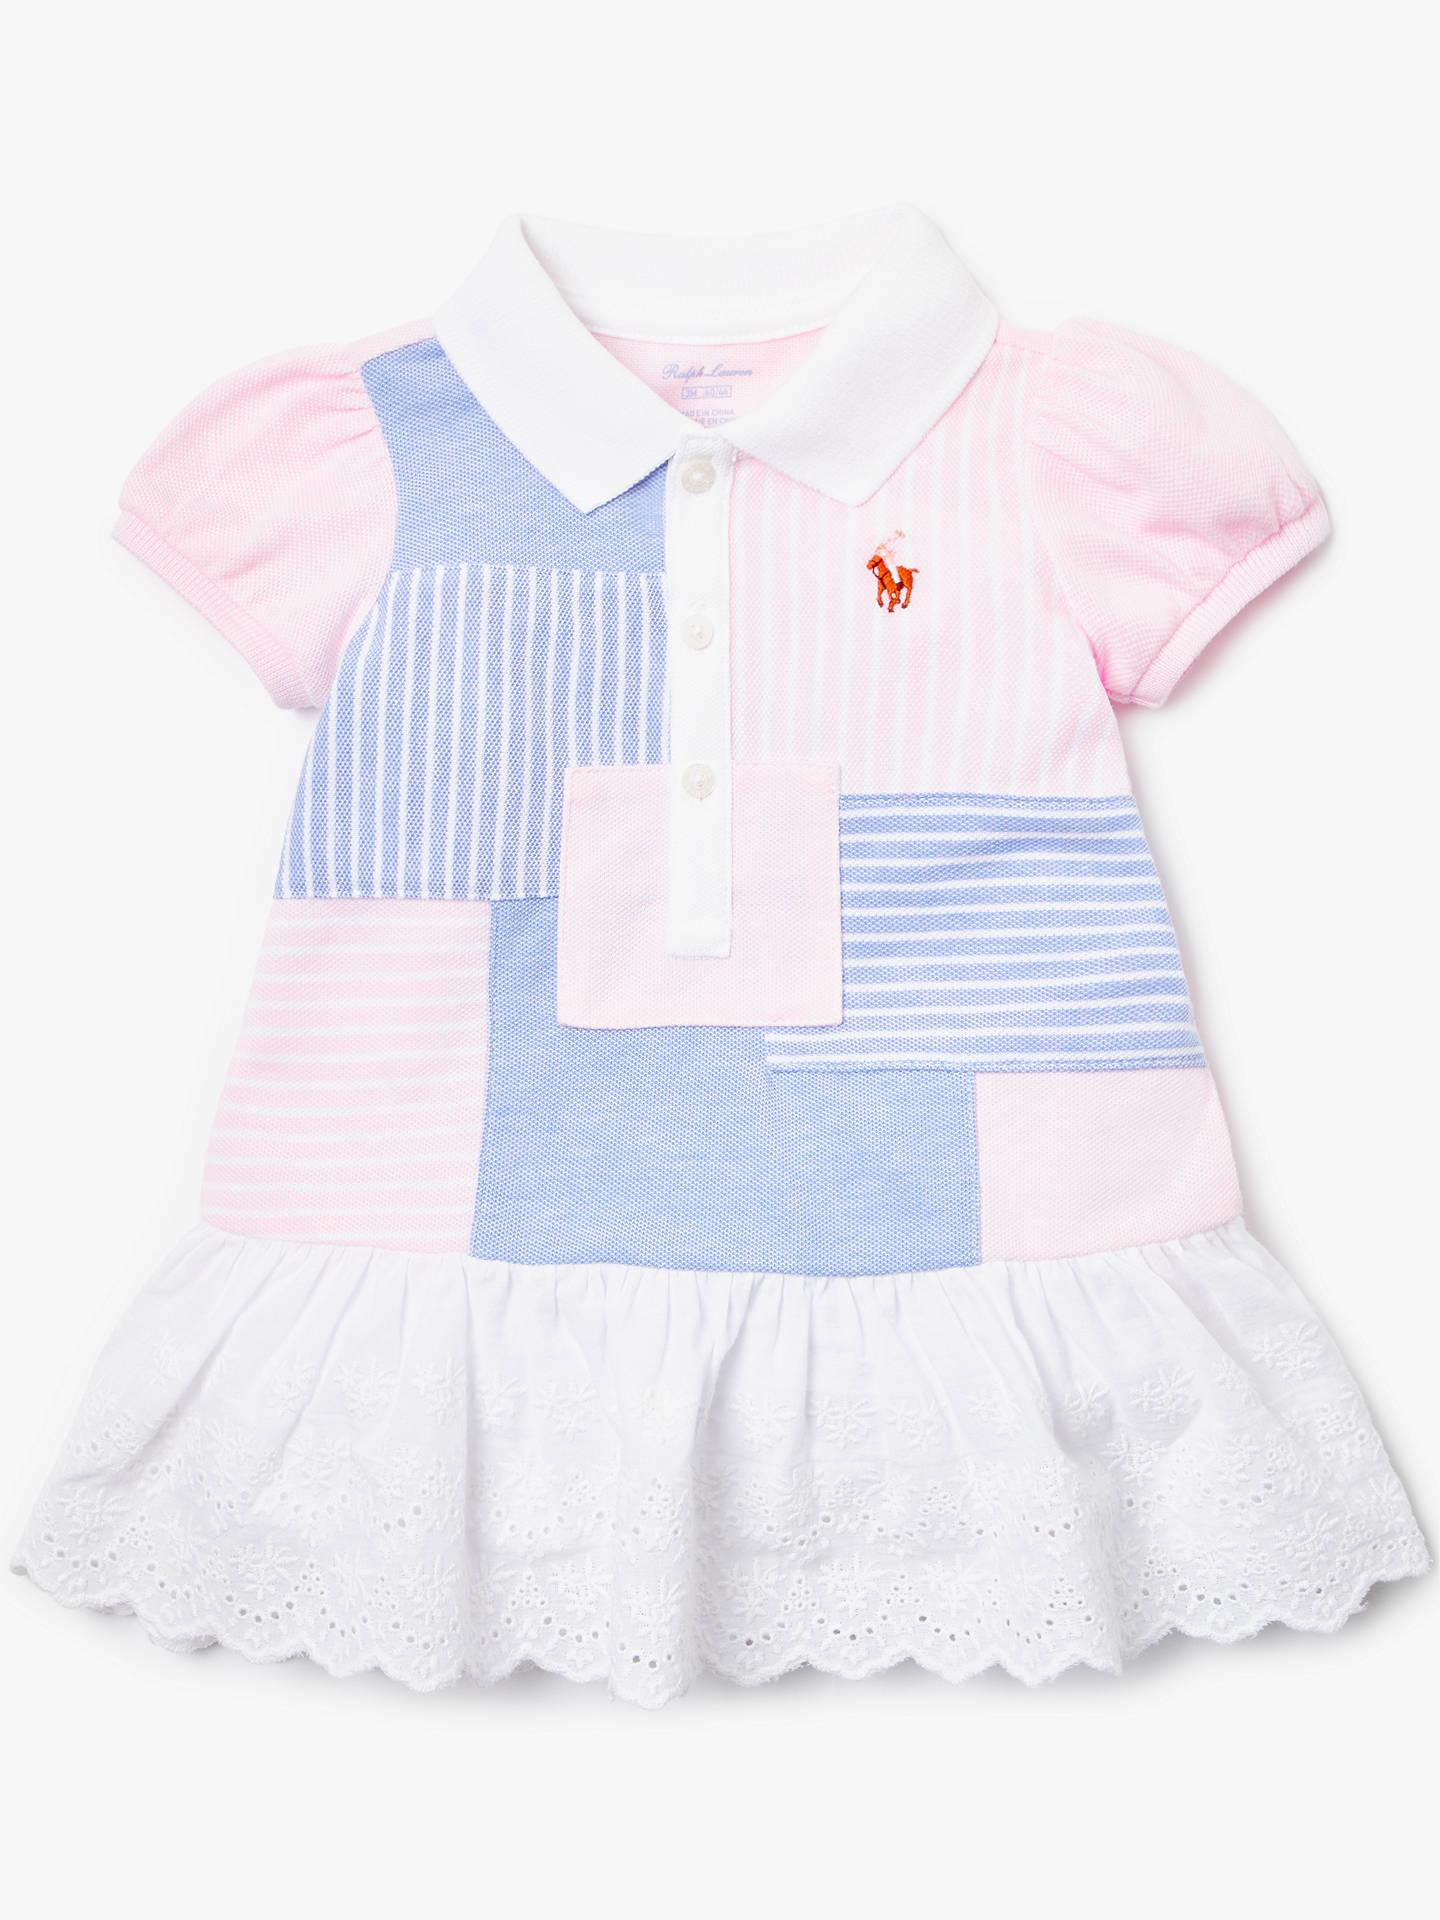 035ec38273 Polo Ralph Lauren Baby Patchwork Dress, Pink at John Lewis & Partners